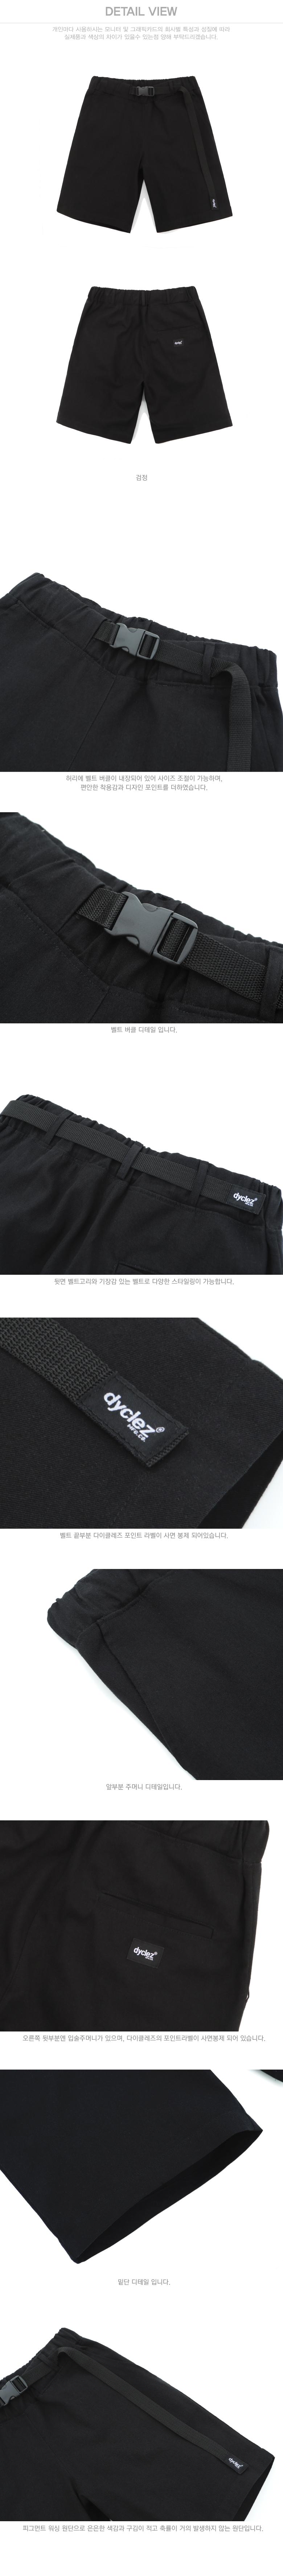 20180404_dy_pigment_short_pants_detail_black_kj.jpg